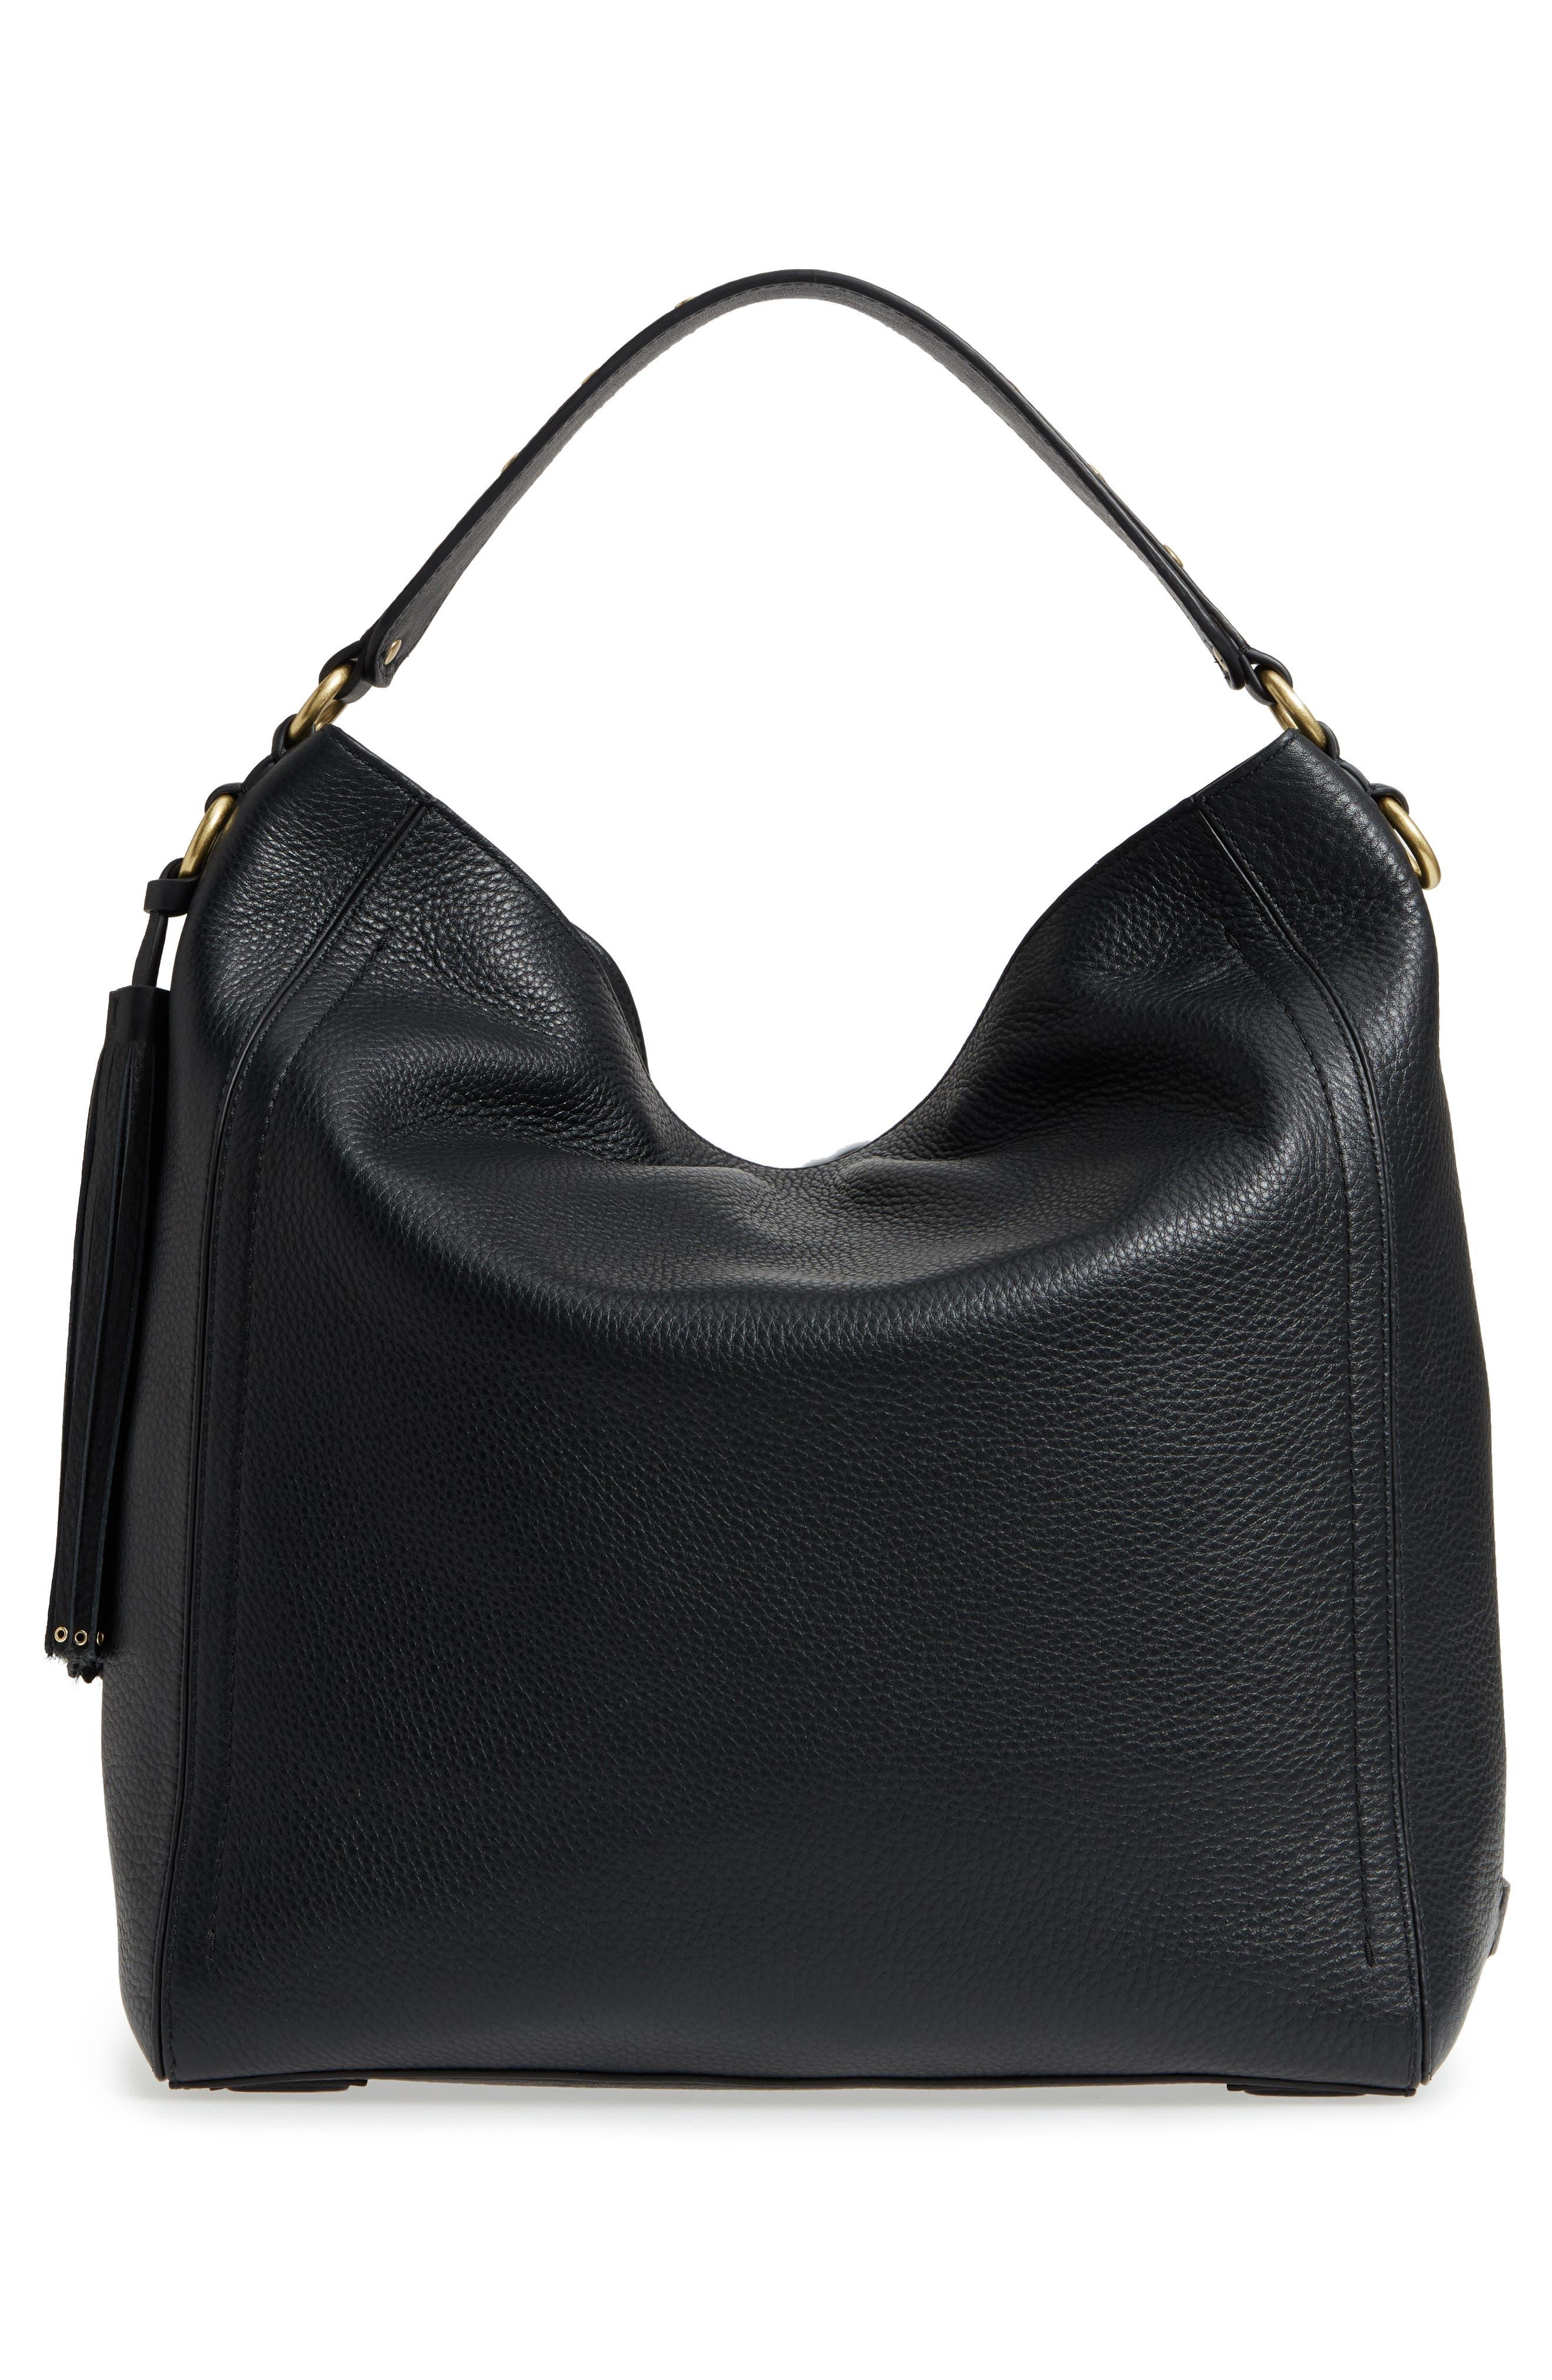 Cassidy RFID Pebbled Leather Bucket Bag,                             Alternate thumbnail 3, color,                             001